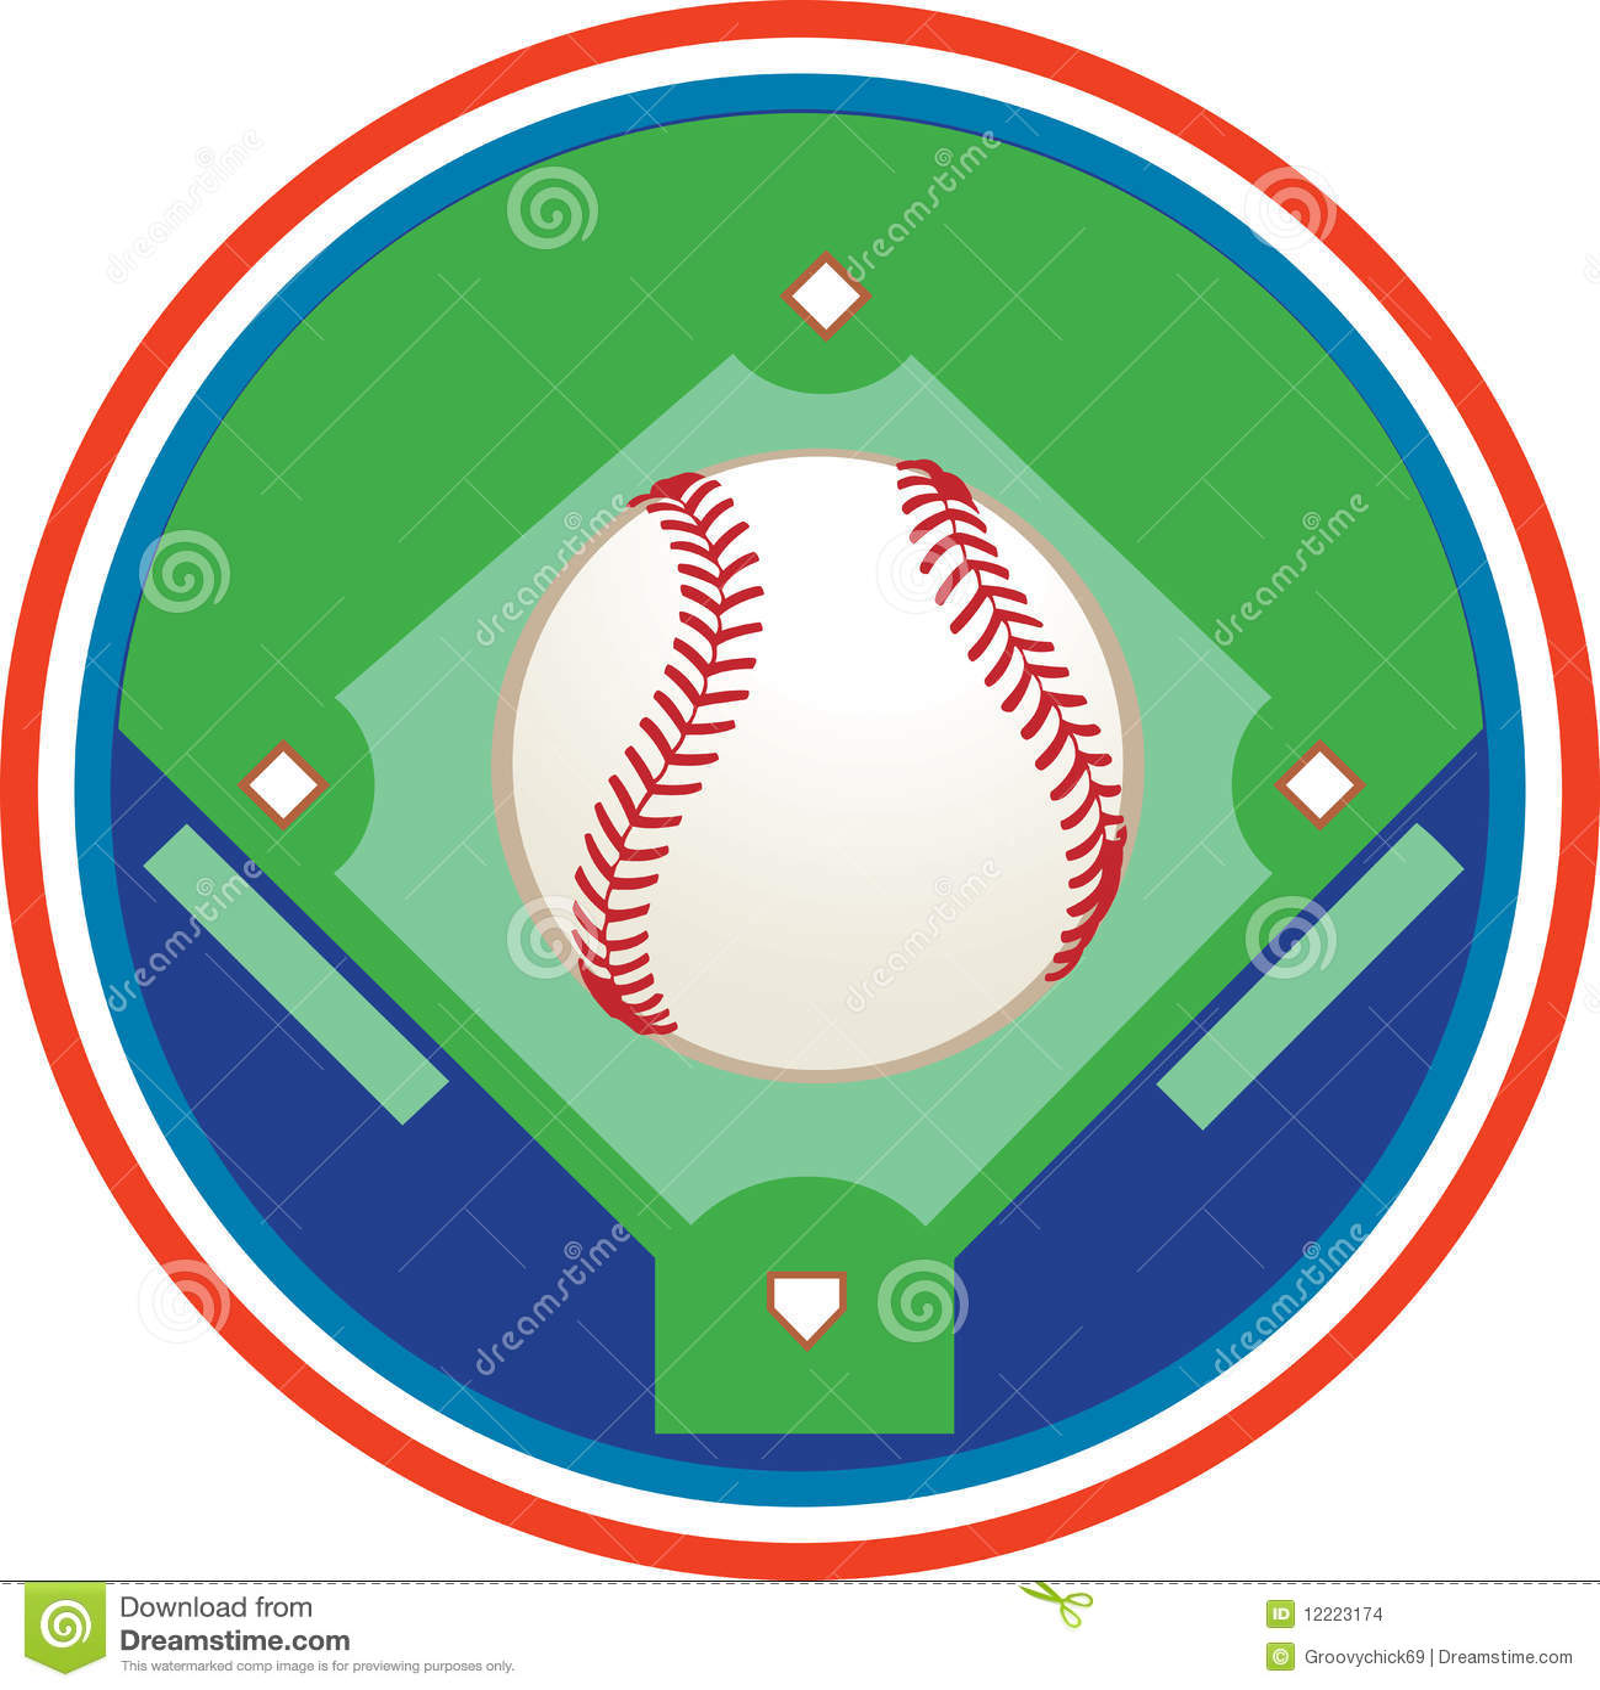 Baseball Field Clipart A baseball field